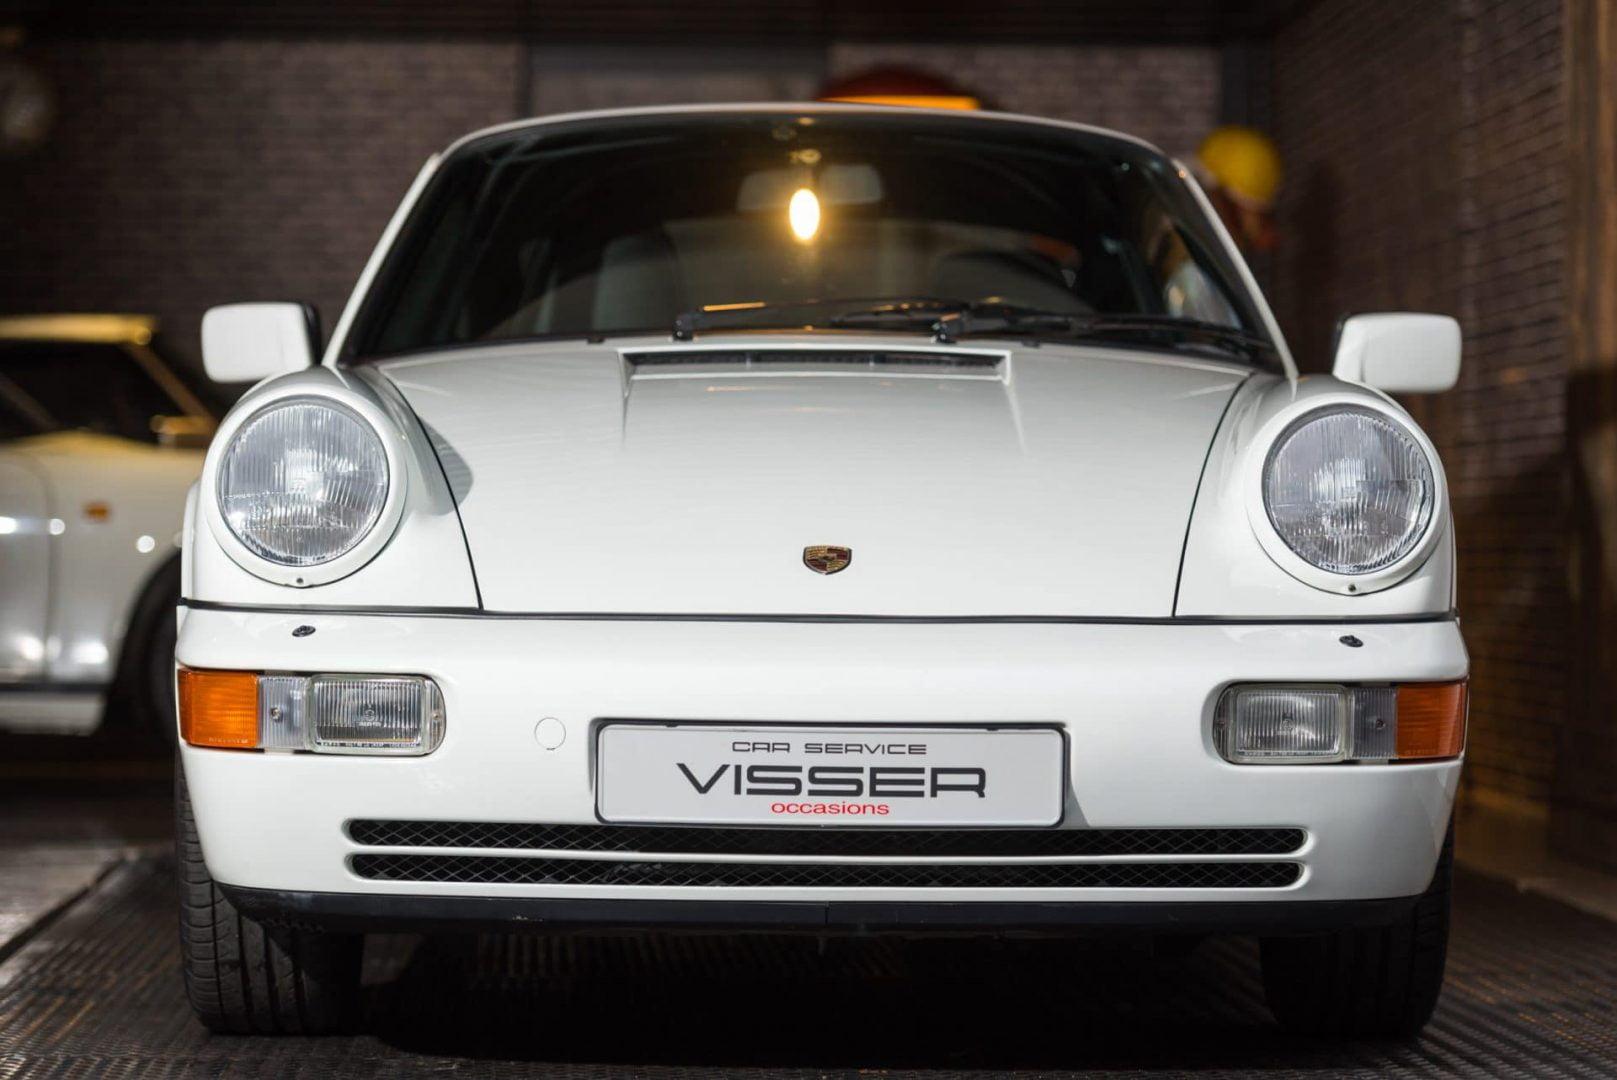 Porsche 964 Carrera 2 handgeschakelde Coupé Grand Prix Weiß